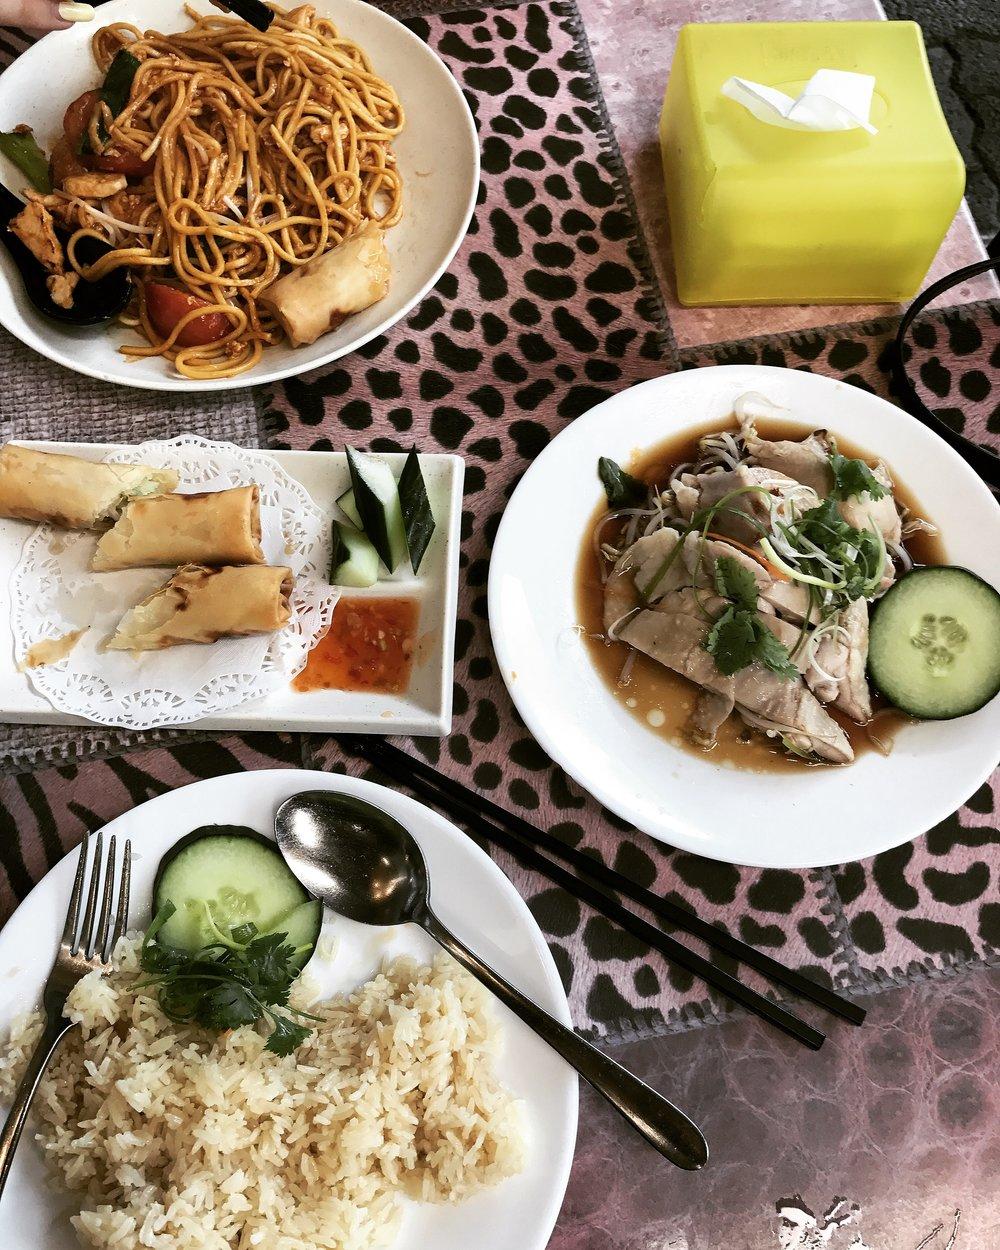 Selera Malaysian restaurant in Newmarket